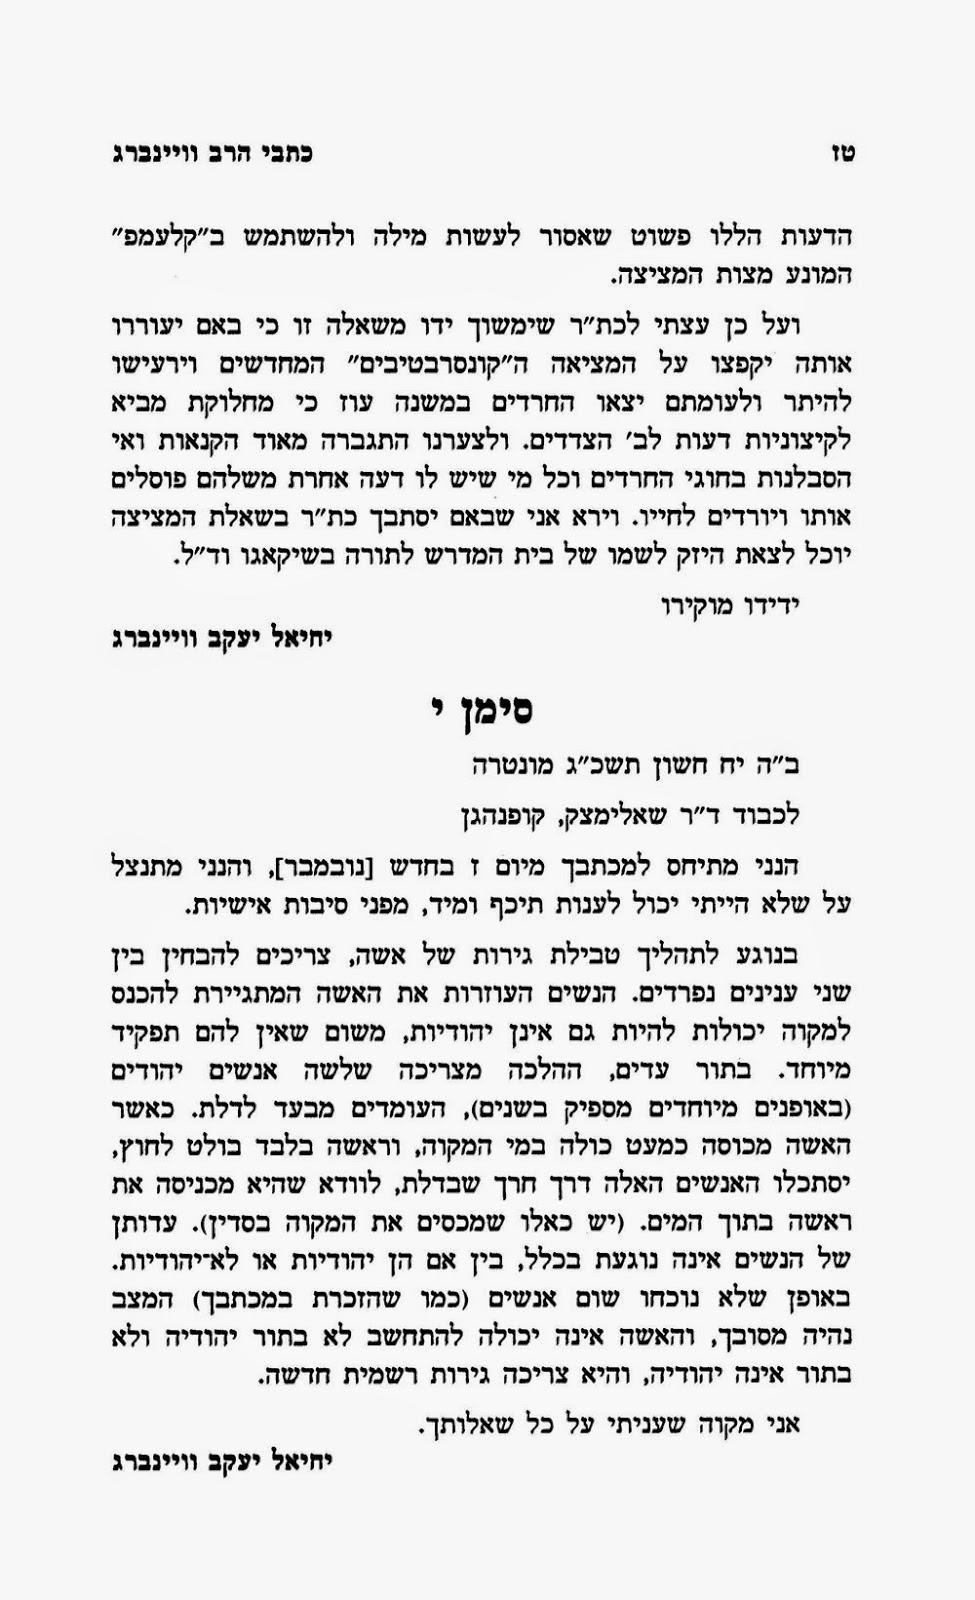 Self-Censorship in the Arukh ha-Shulhan, ArtScroll's Latest